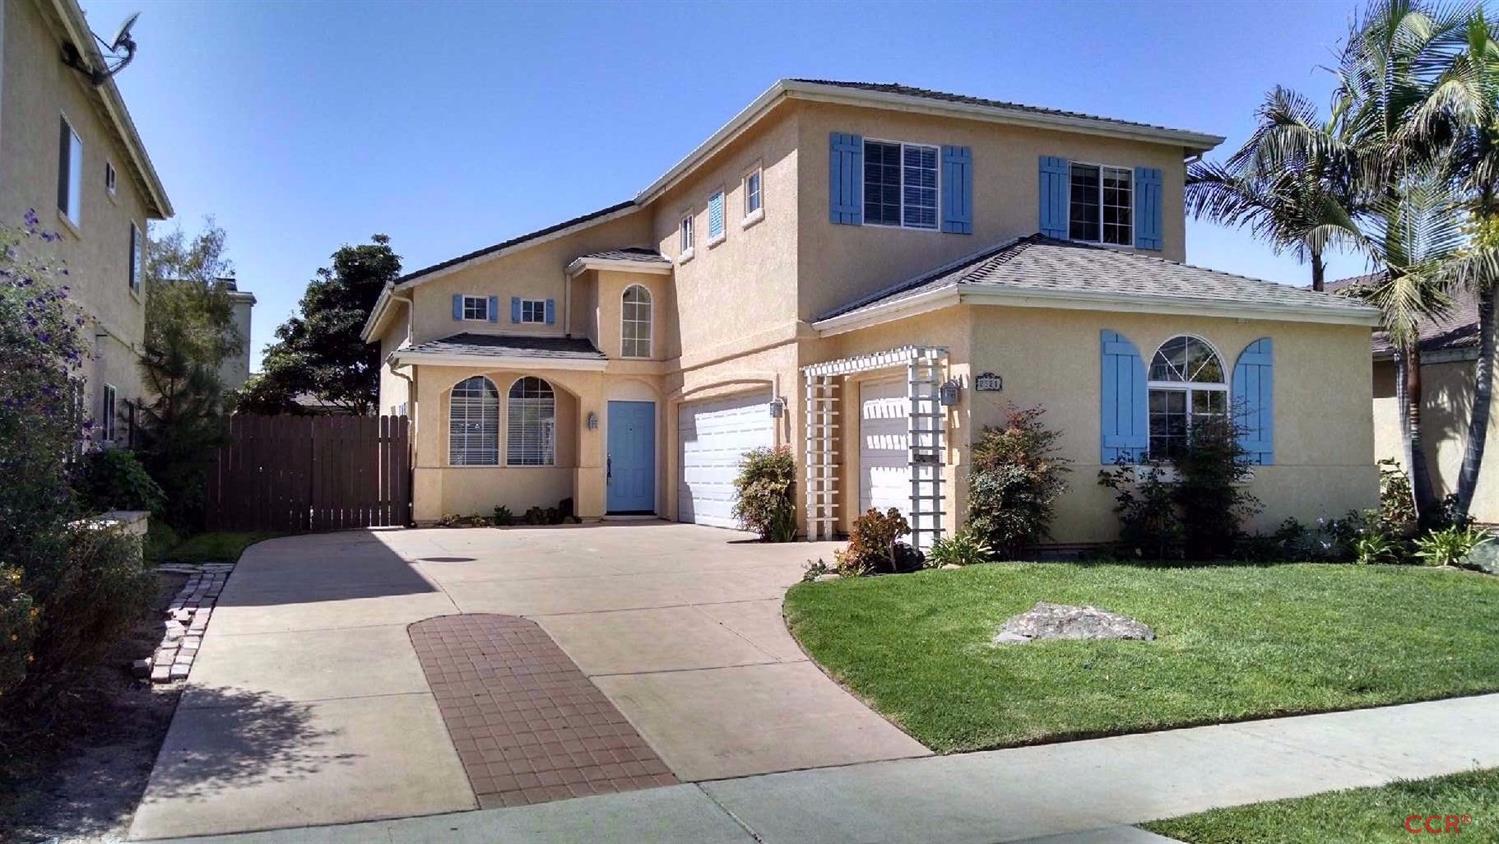 Photo of 2321 Tree Line Drive  Santa Maria  CA